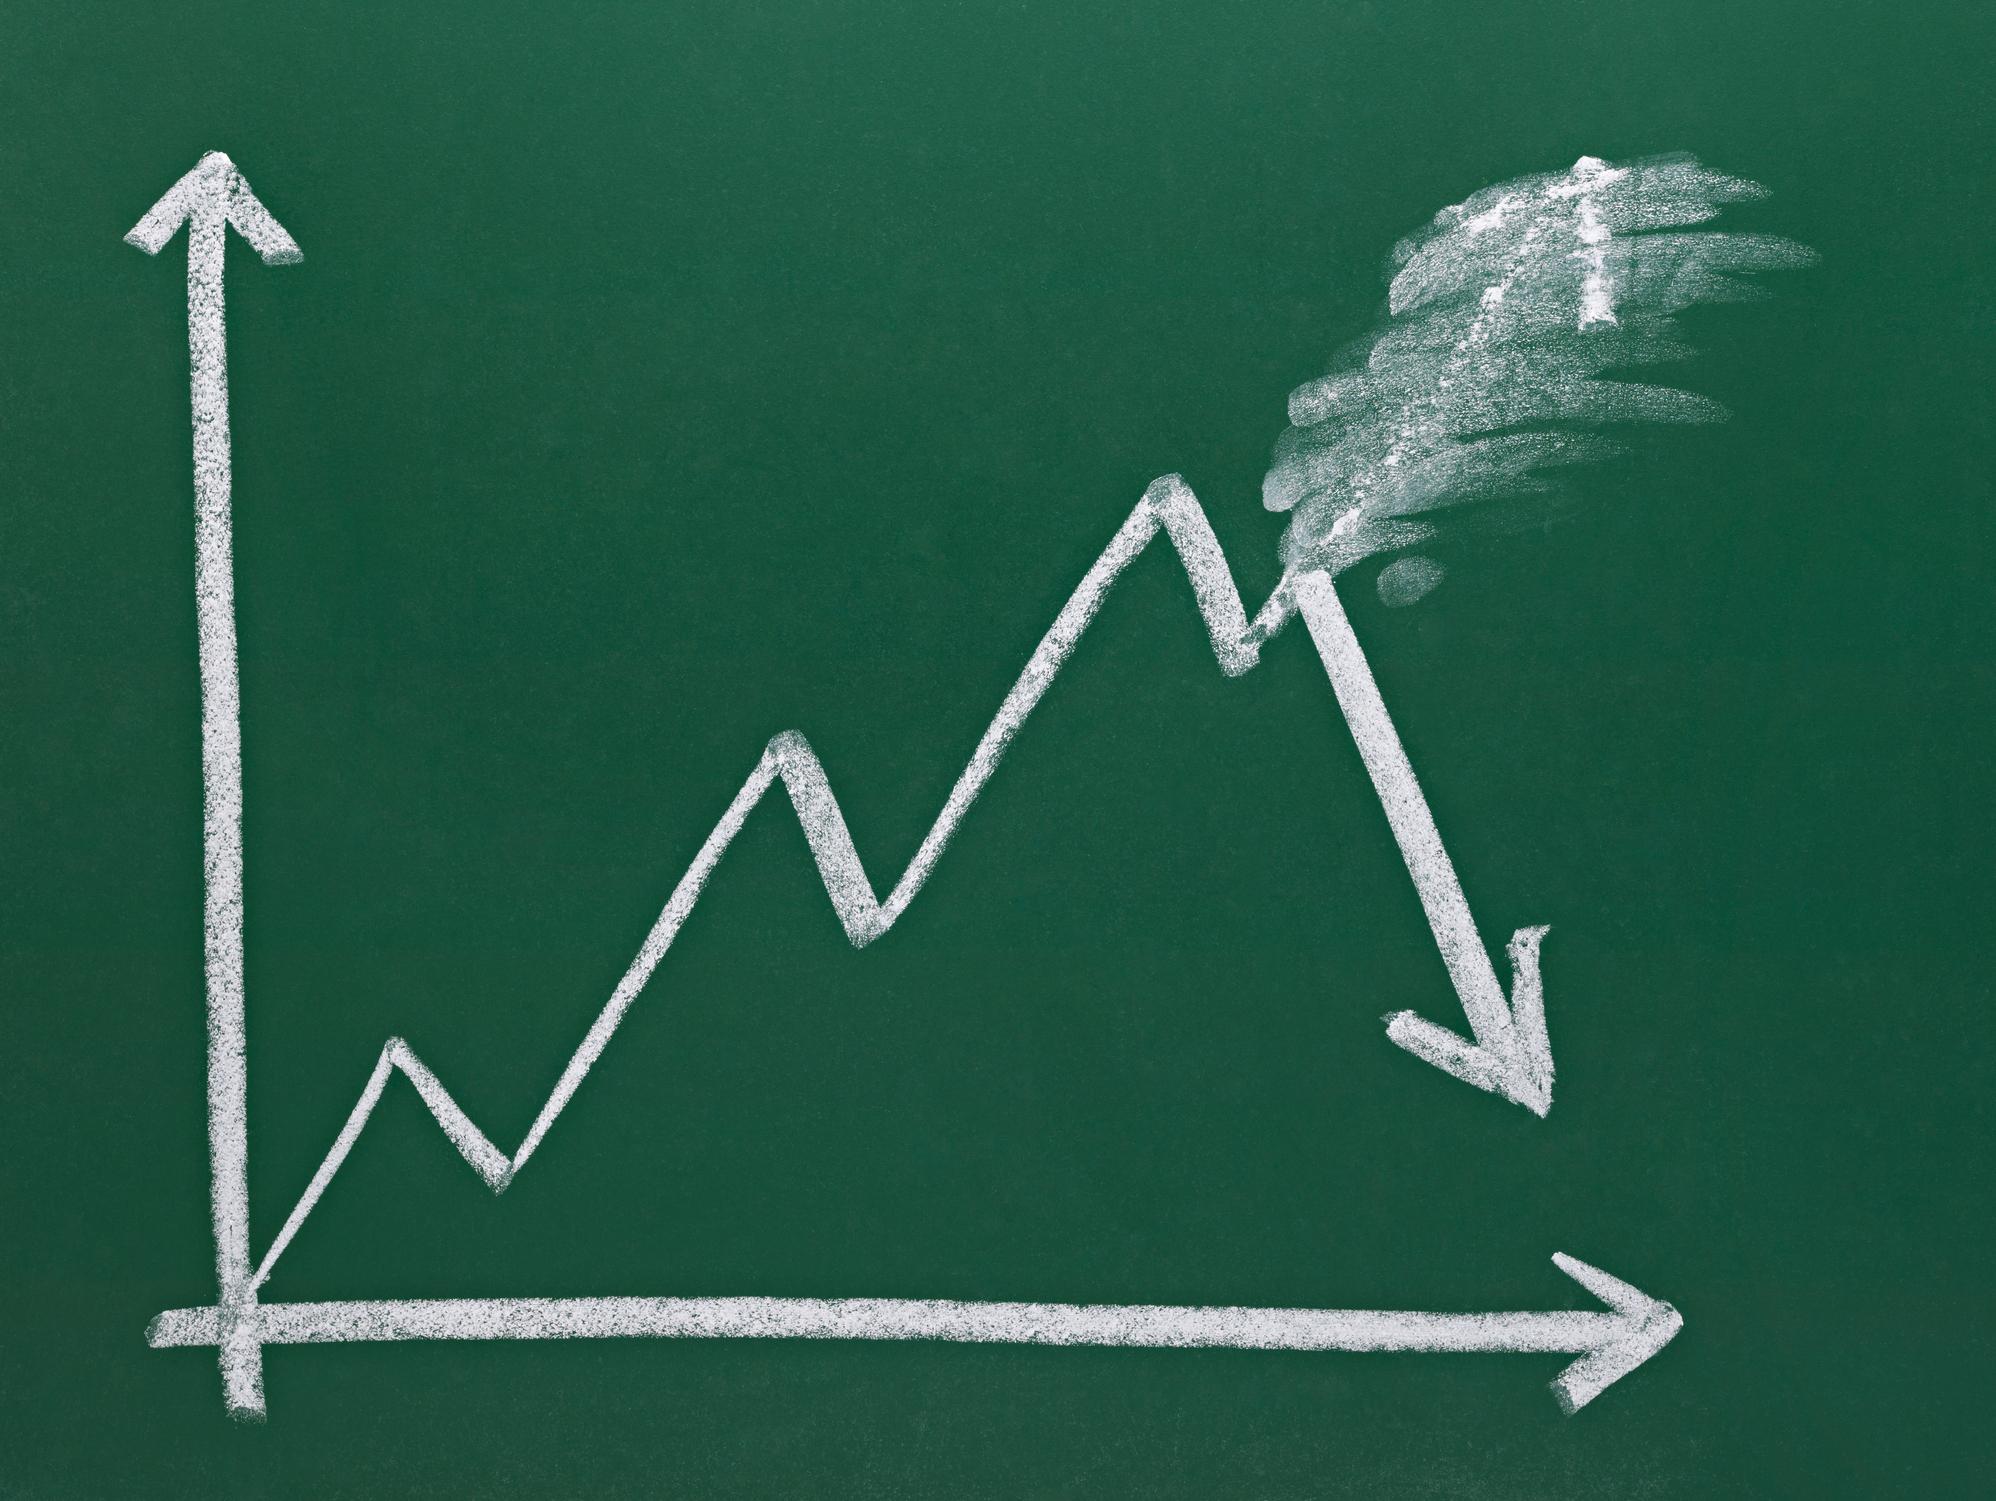 Green chalkboard chart showing a positive trend abruptly turn negative.